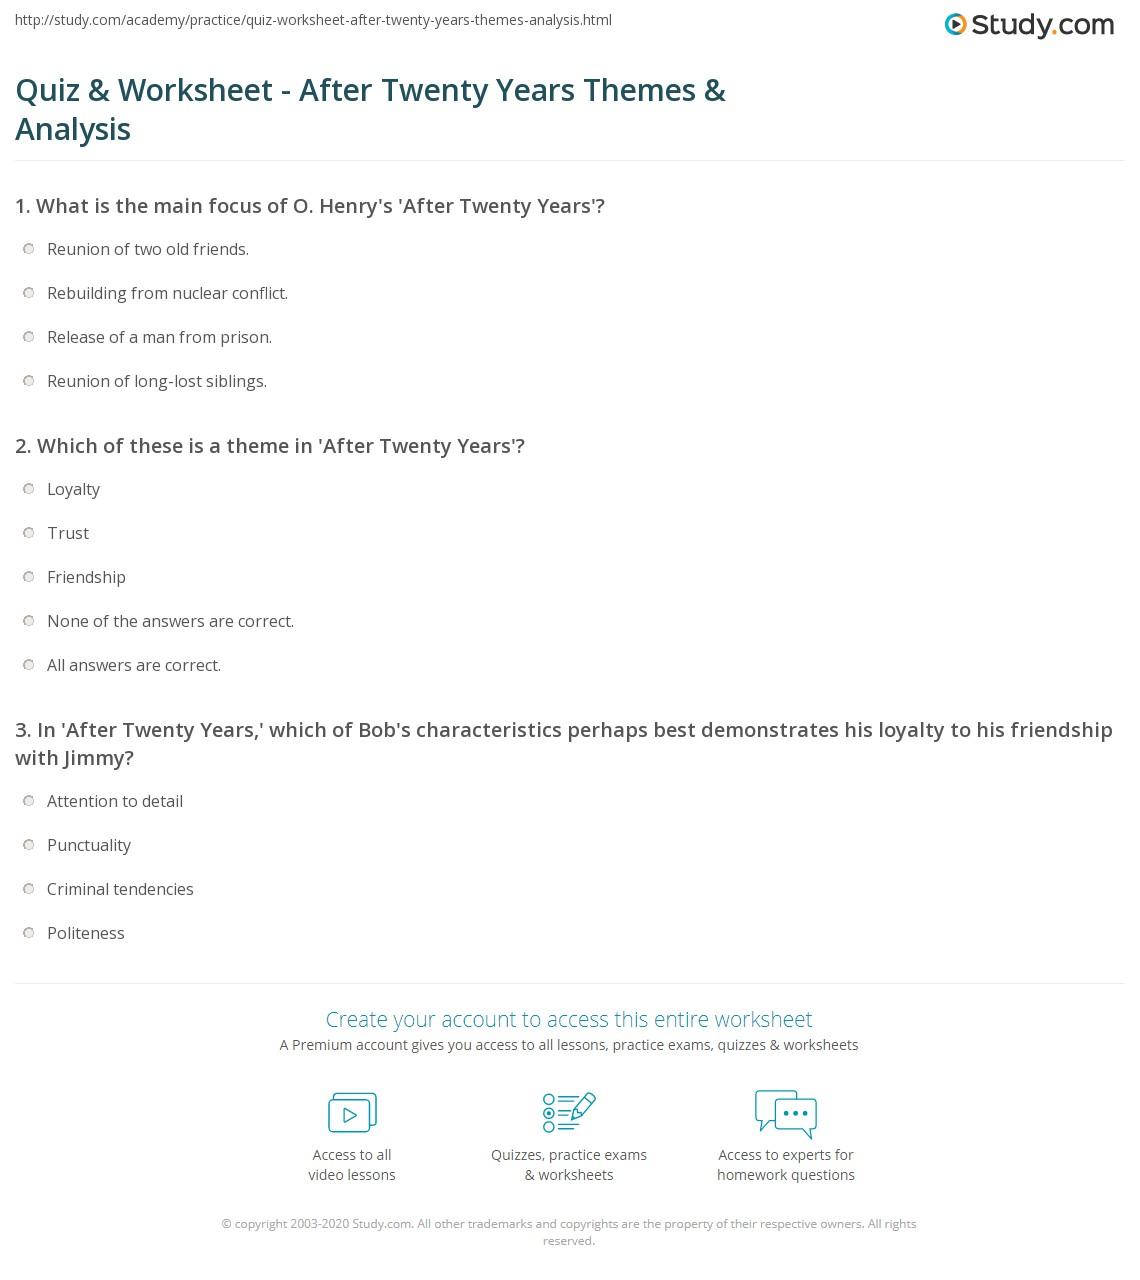 Quiz & Worksheet - After Twenty Years Themes & Analysis | Study com